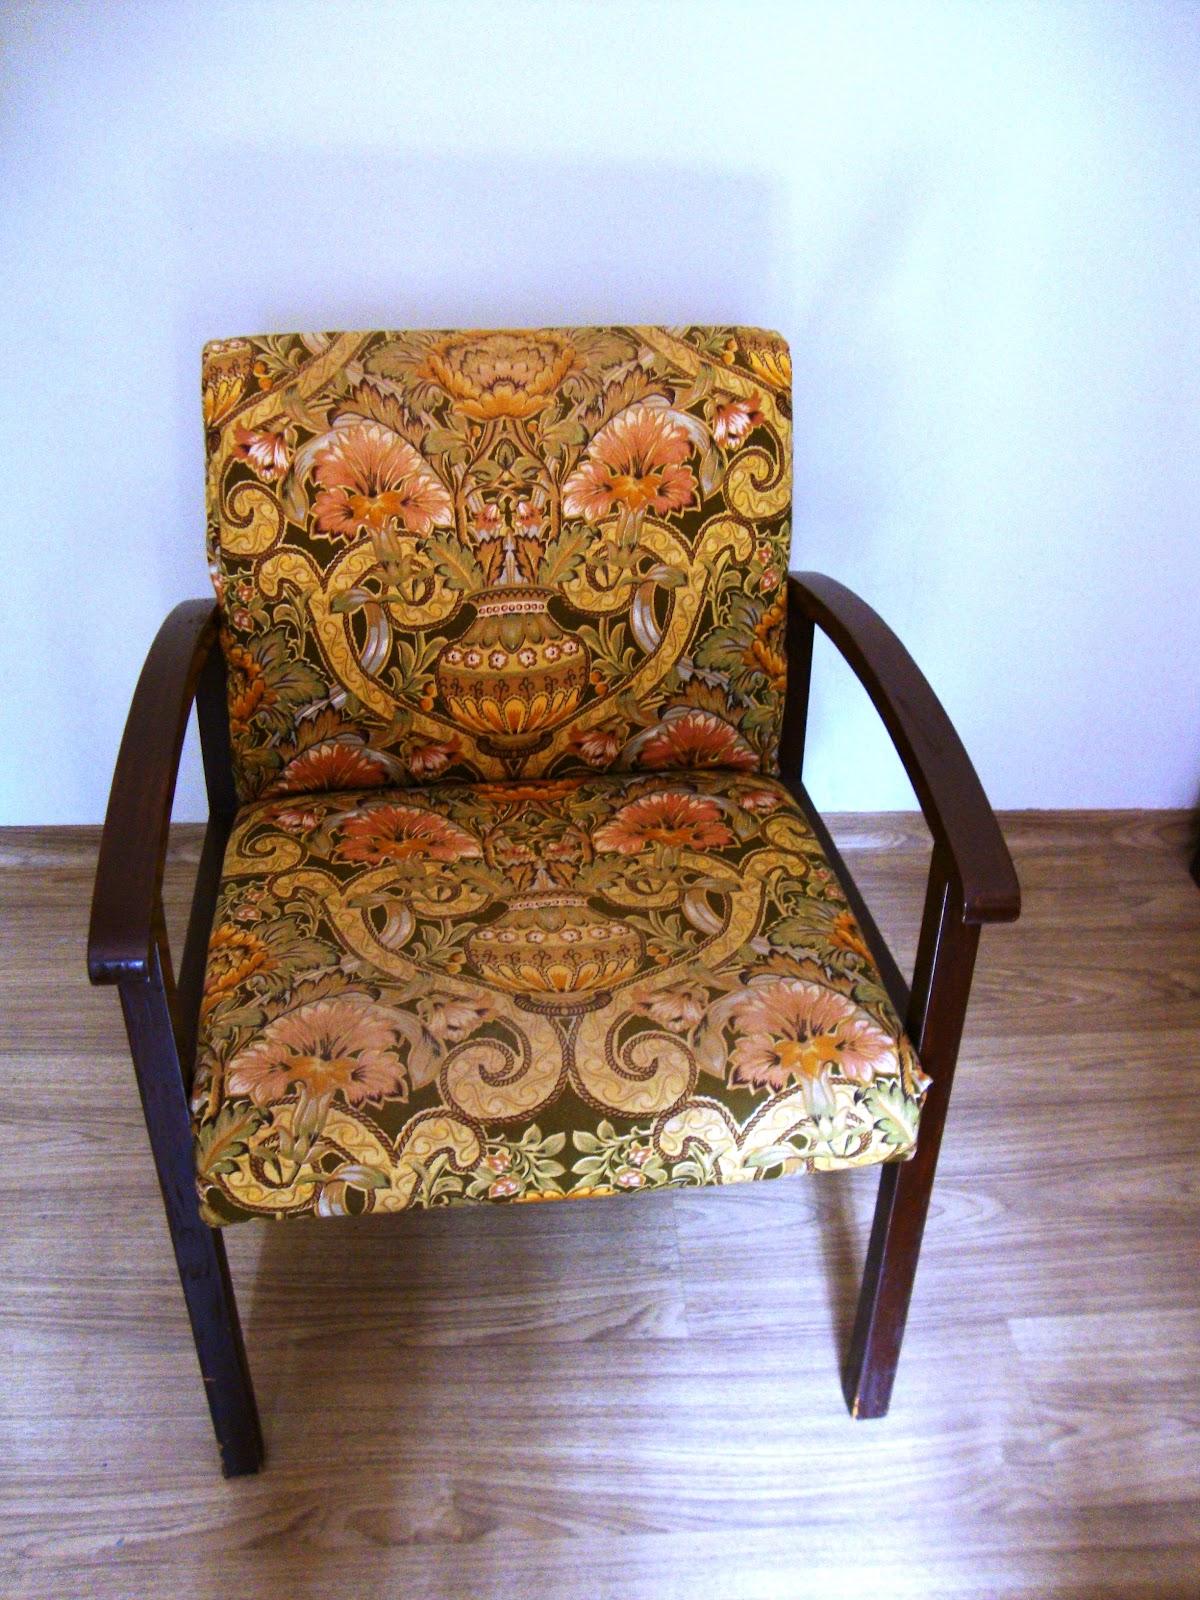 Babuchy Decor: Capa para Cadeira #1B5AB0 1200x1600